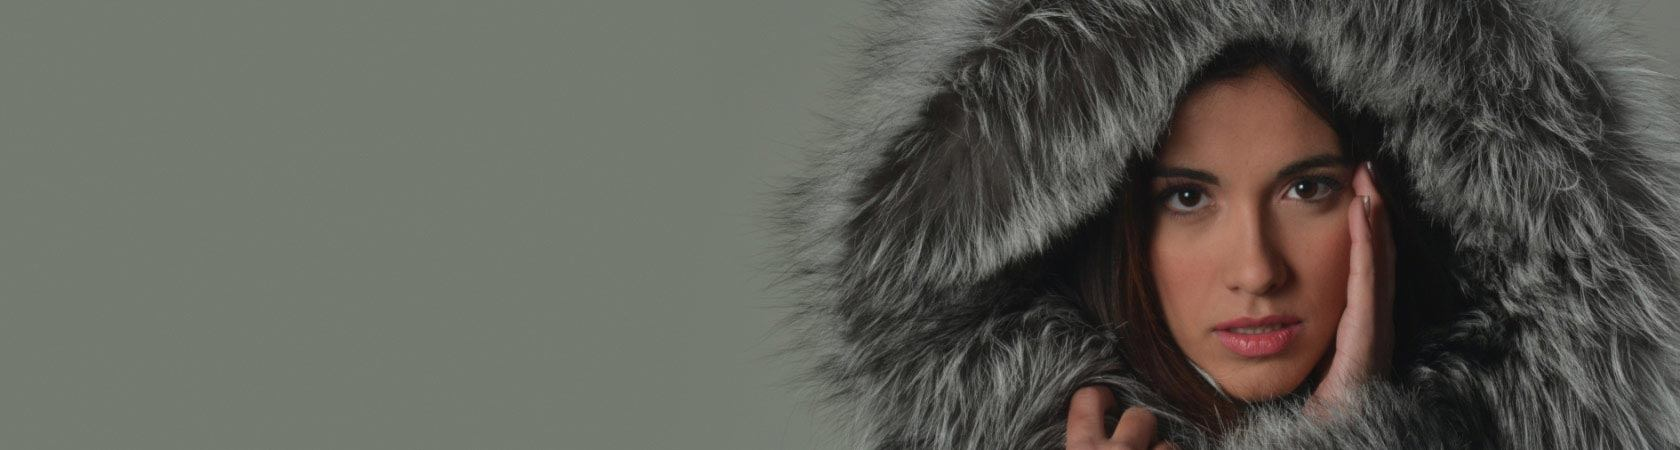 SILVER FOX FUR COAT WITH HOOD KNEE LENGTH